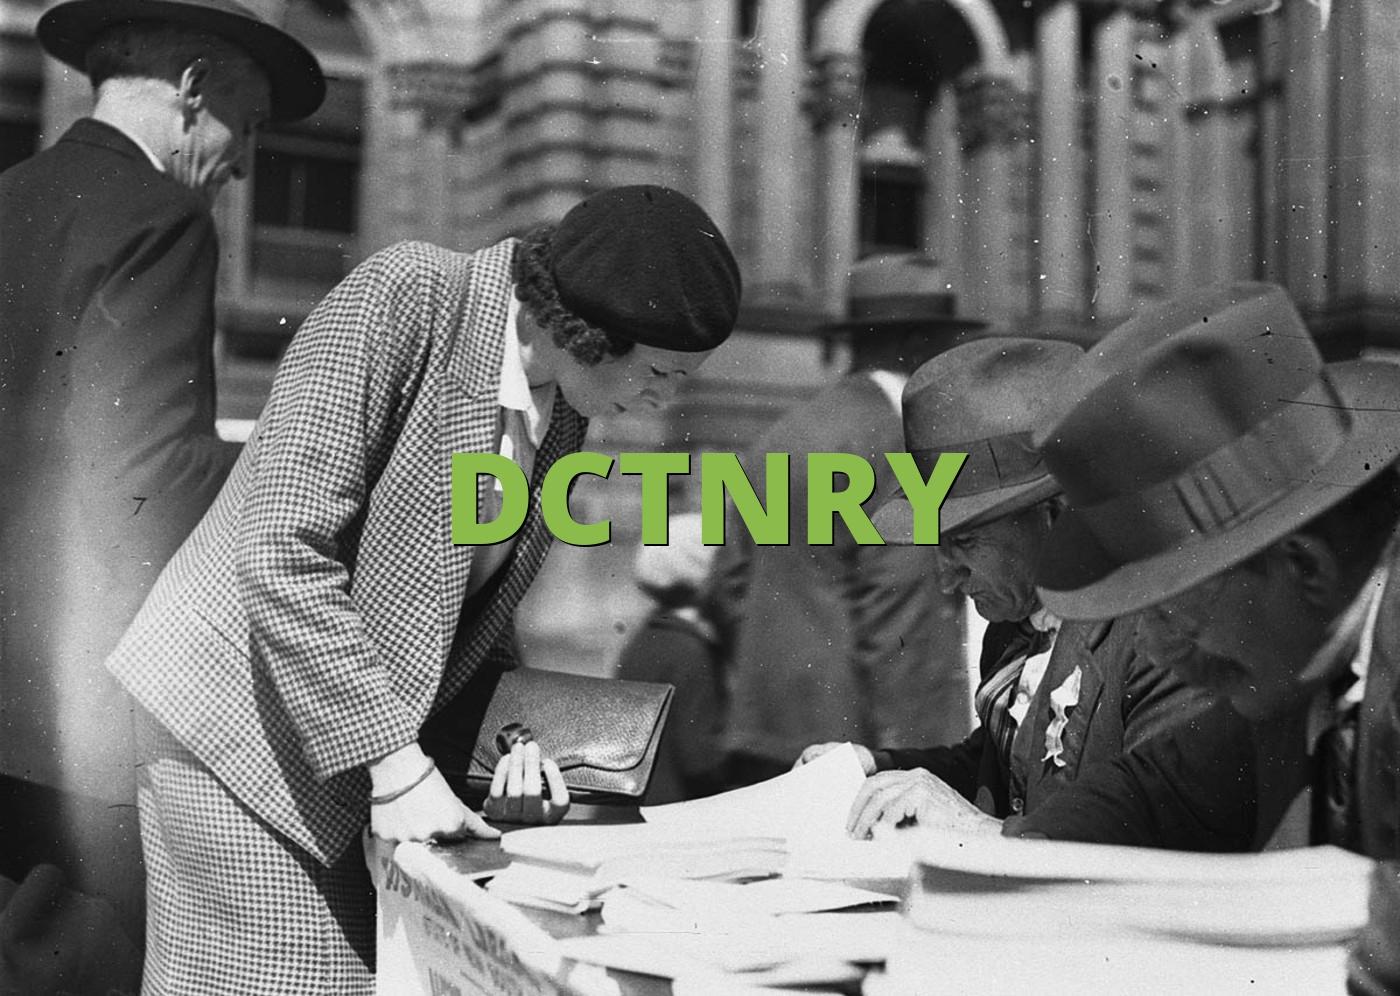 DCTNRY